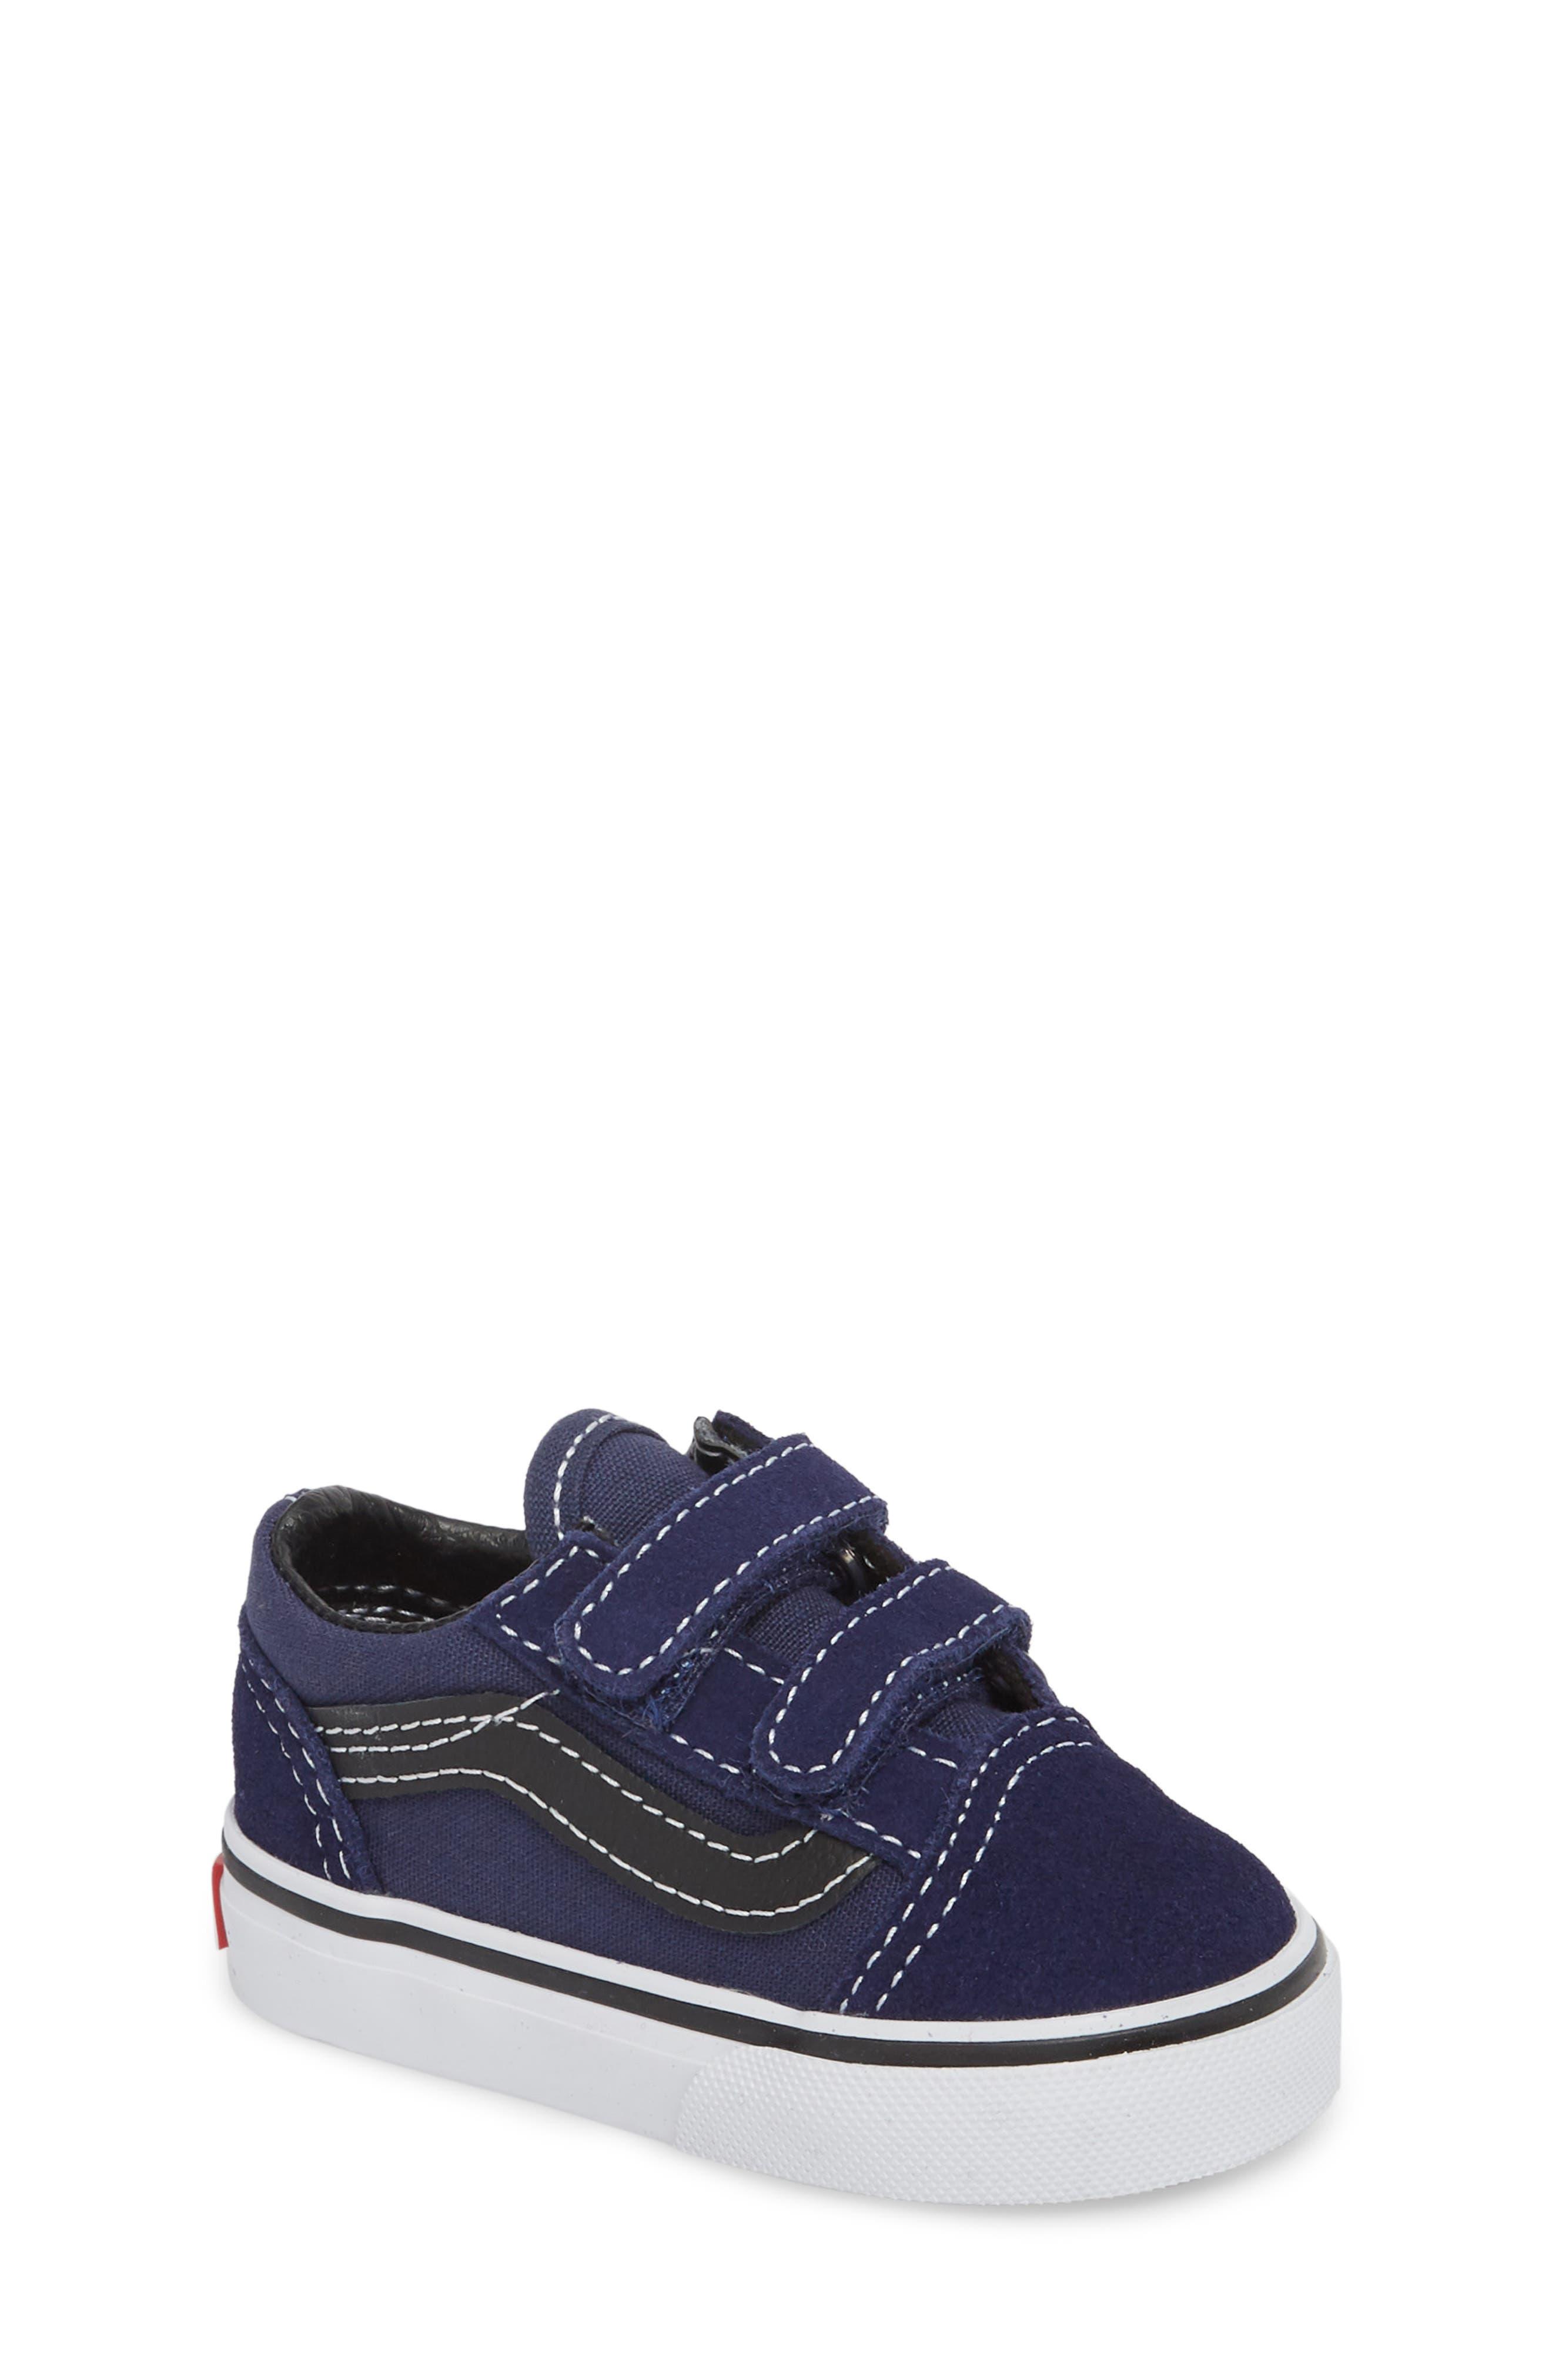 Old Skool V Sneaker,                         Main,                         color, Medieval Blue/ Black